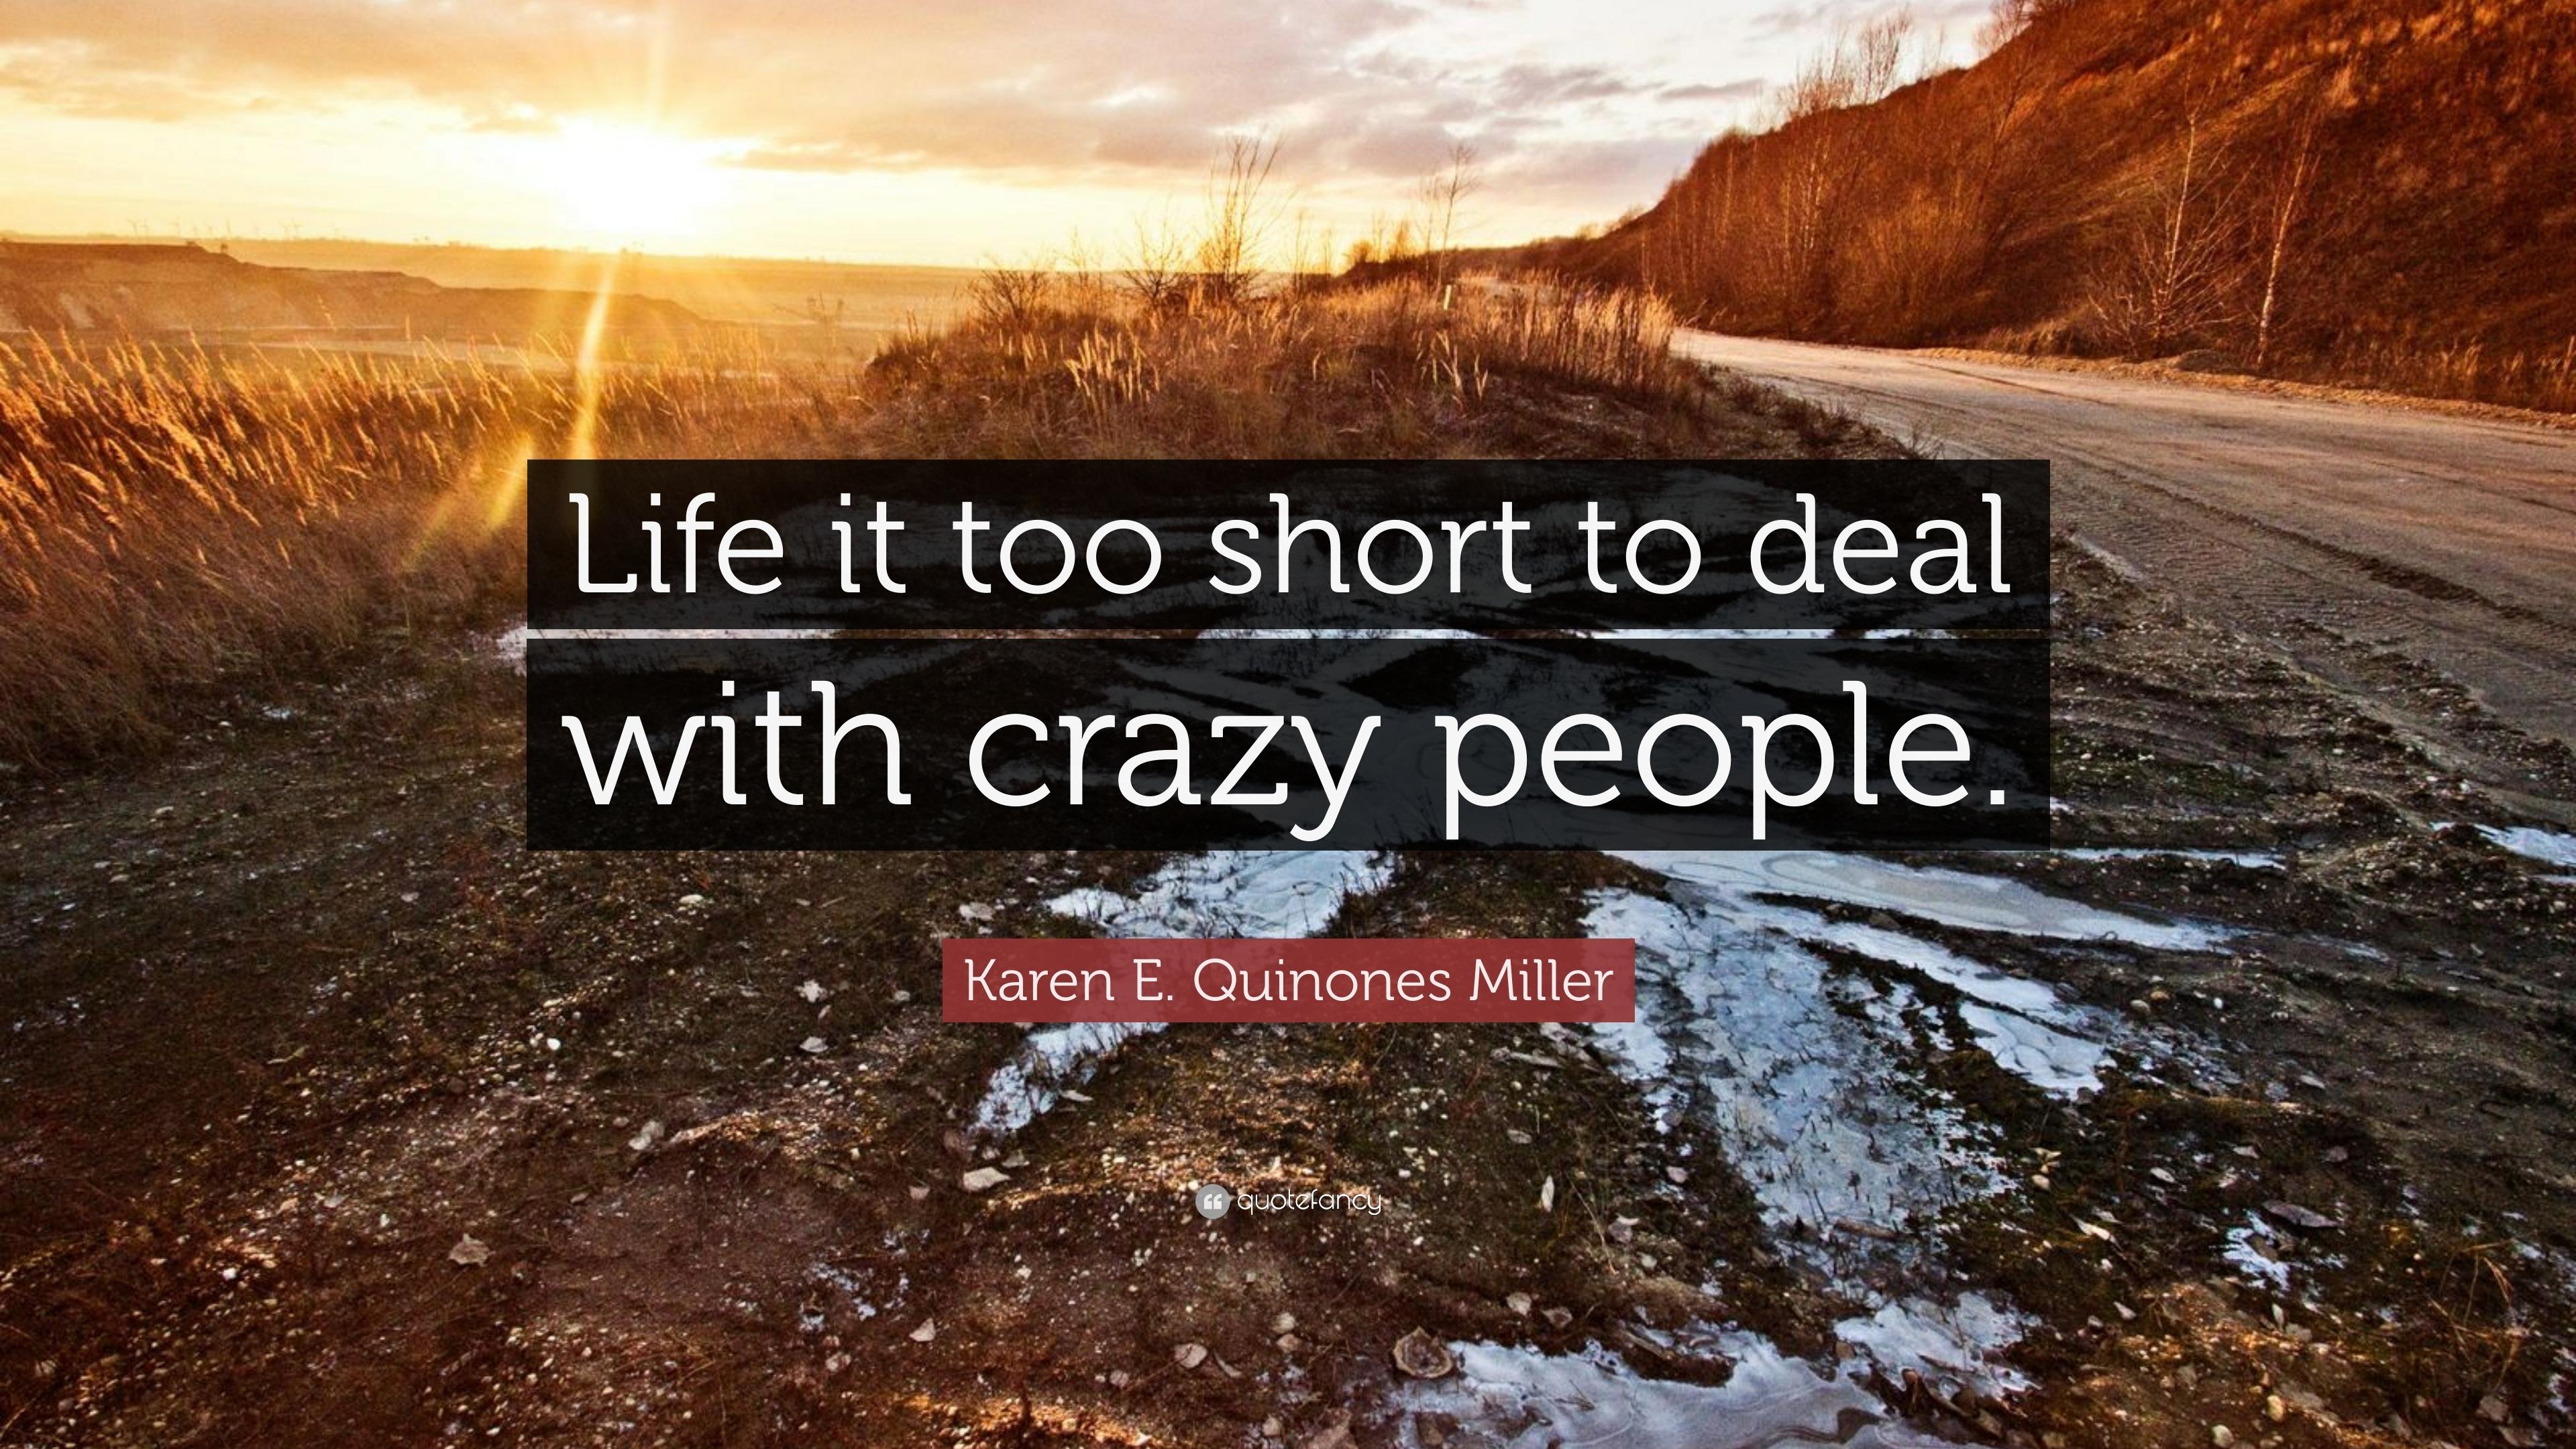 Karen E Quinones Miller Quote Life It Too Short To Deal With